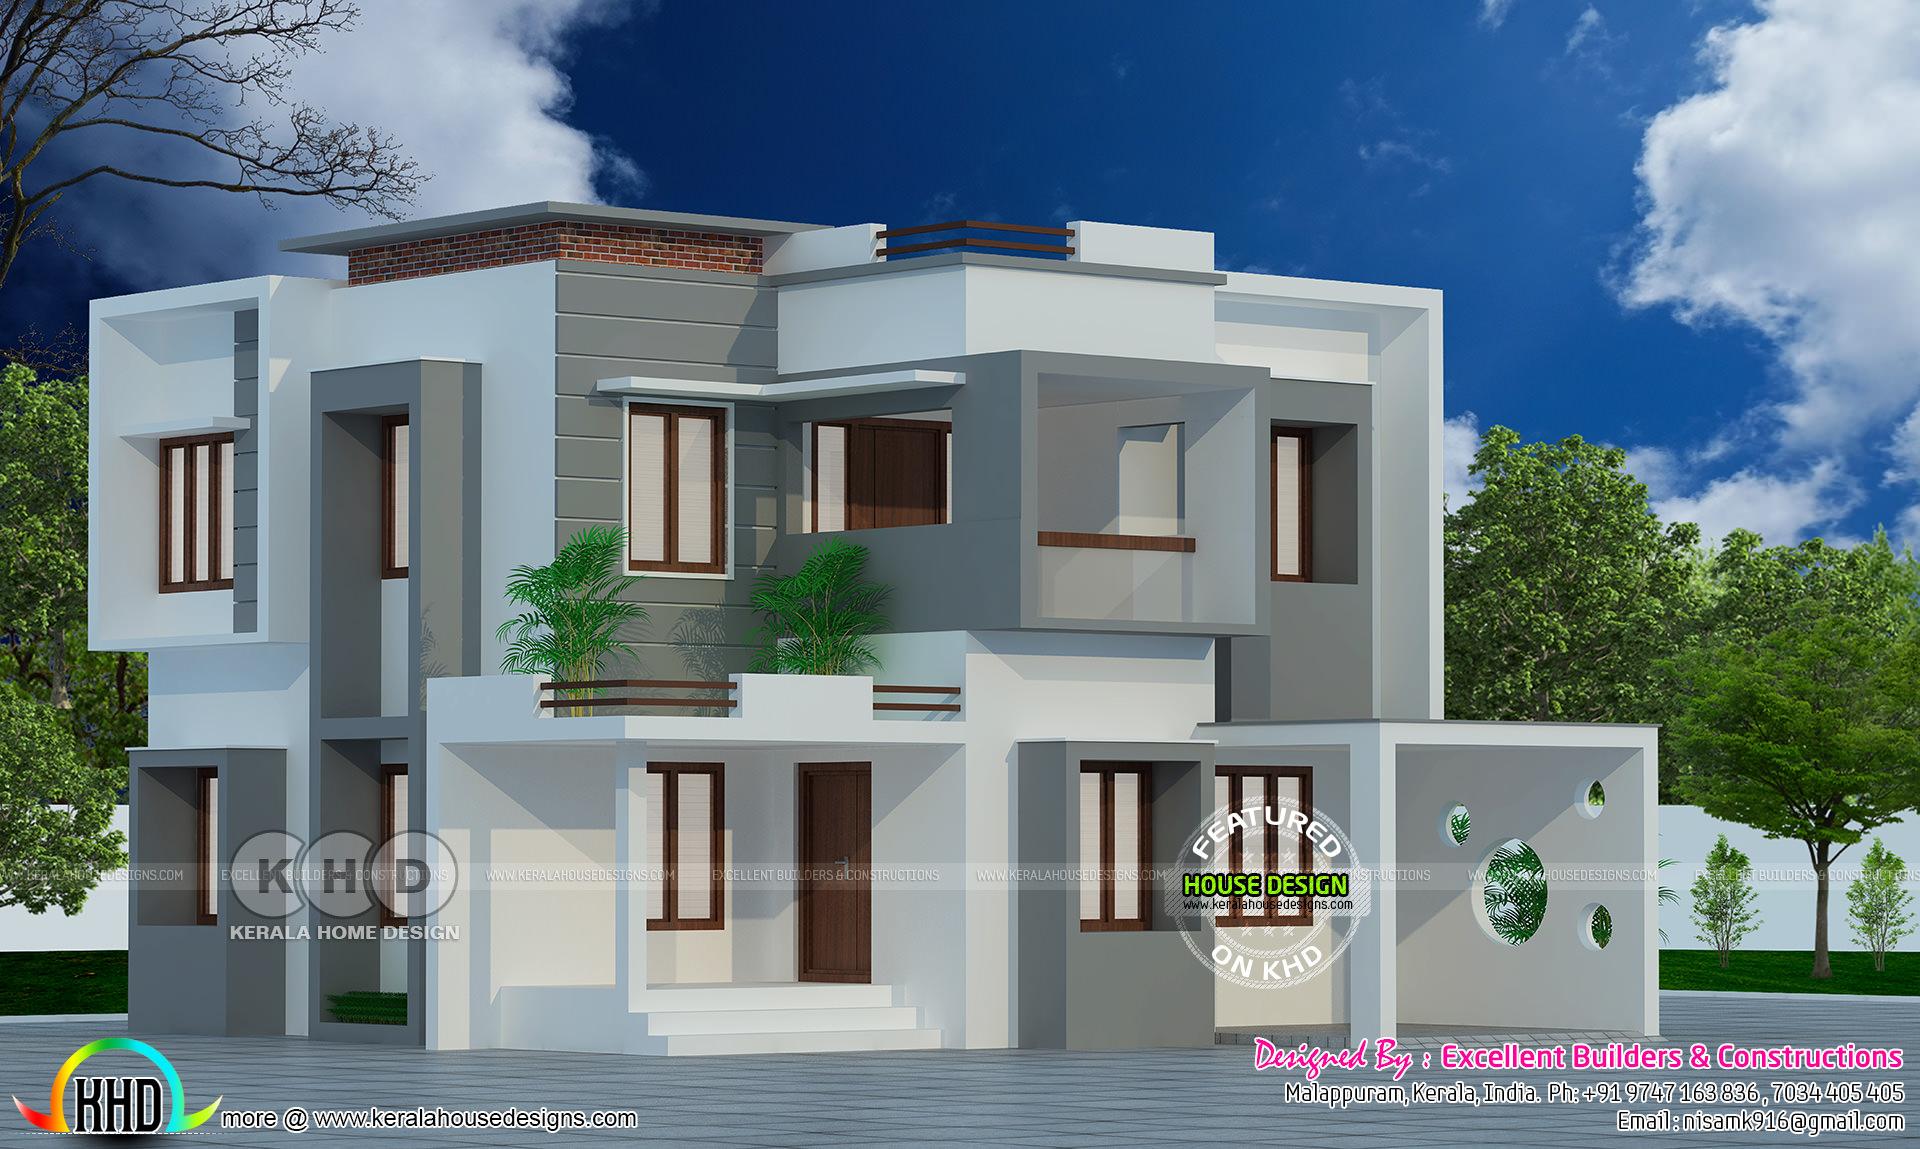 Modern Contemporary Design Flat Roof Construction Kerala Home Design Bloglovin